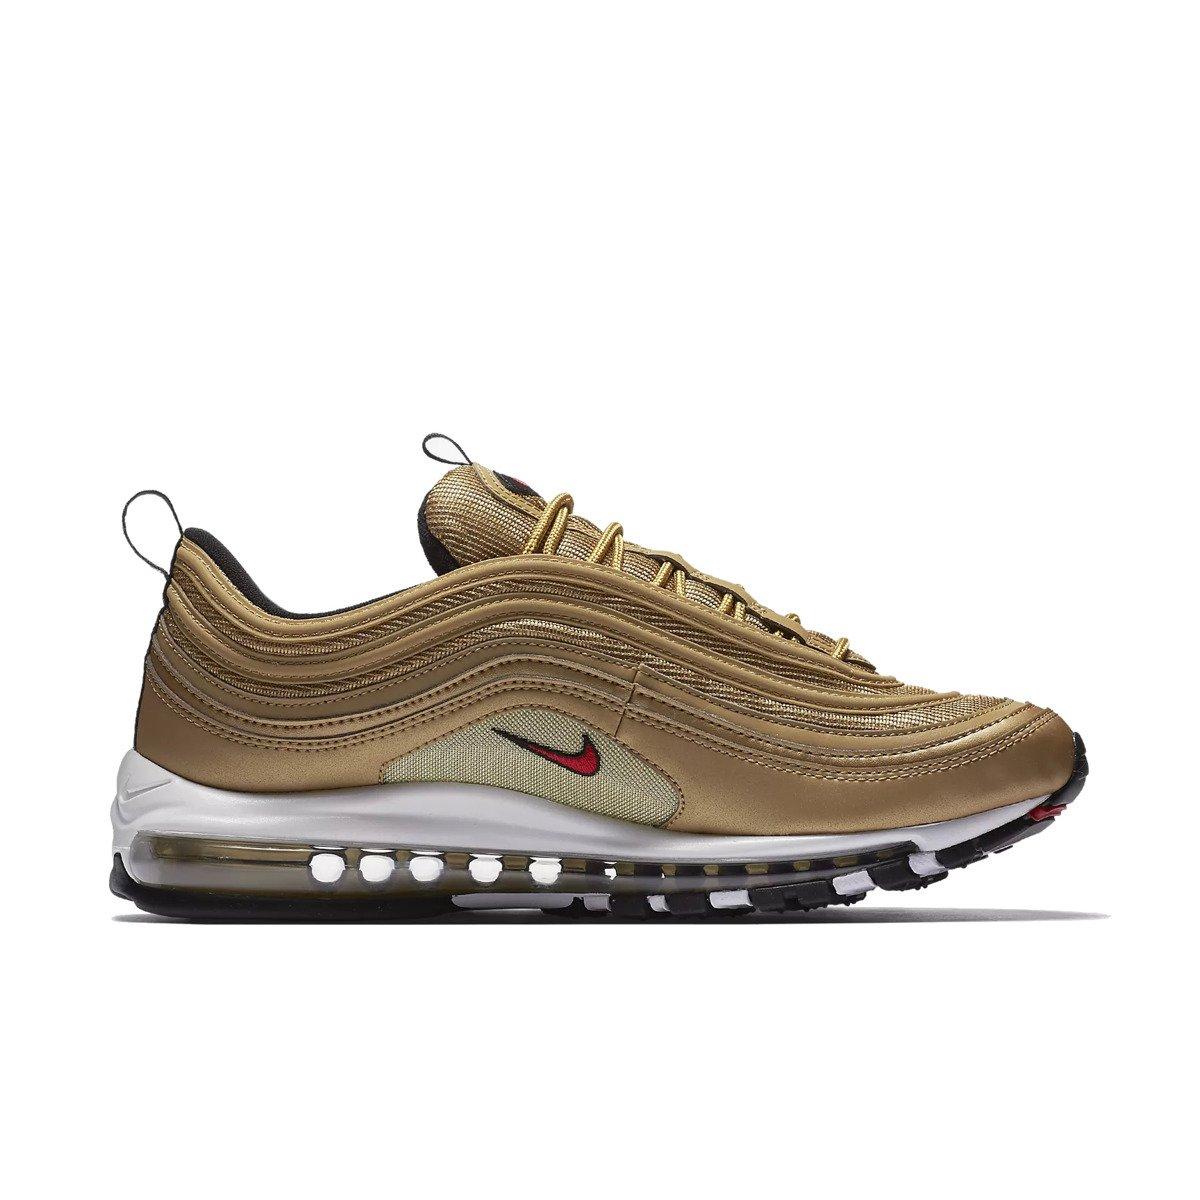 ... Nike Air Max 97 OG QS - 884421-700 ...